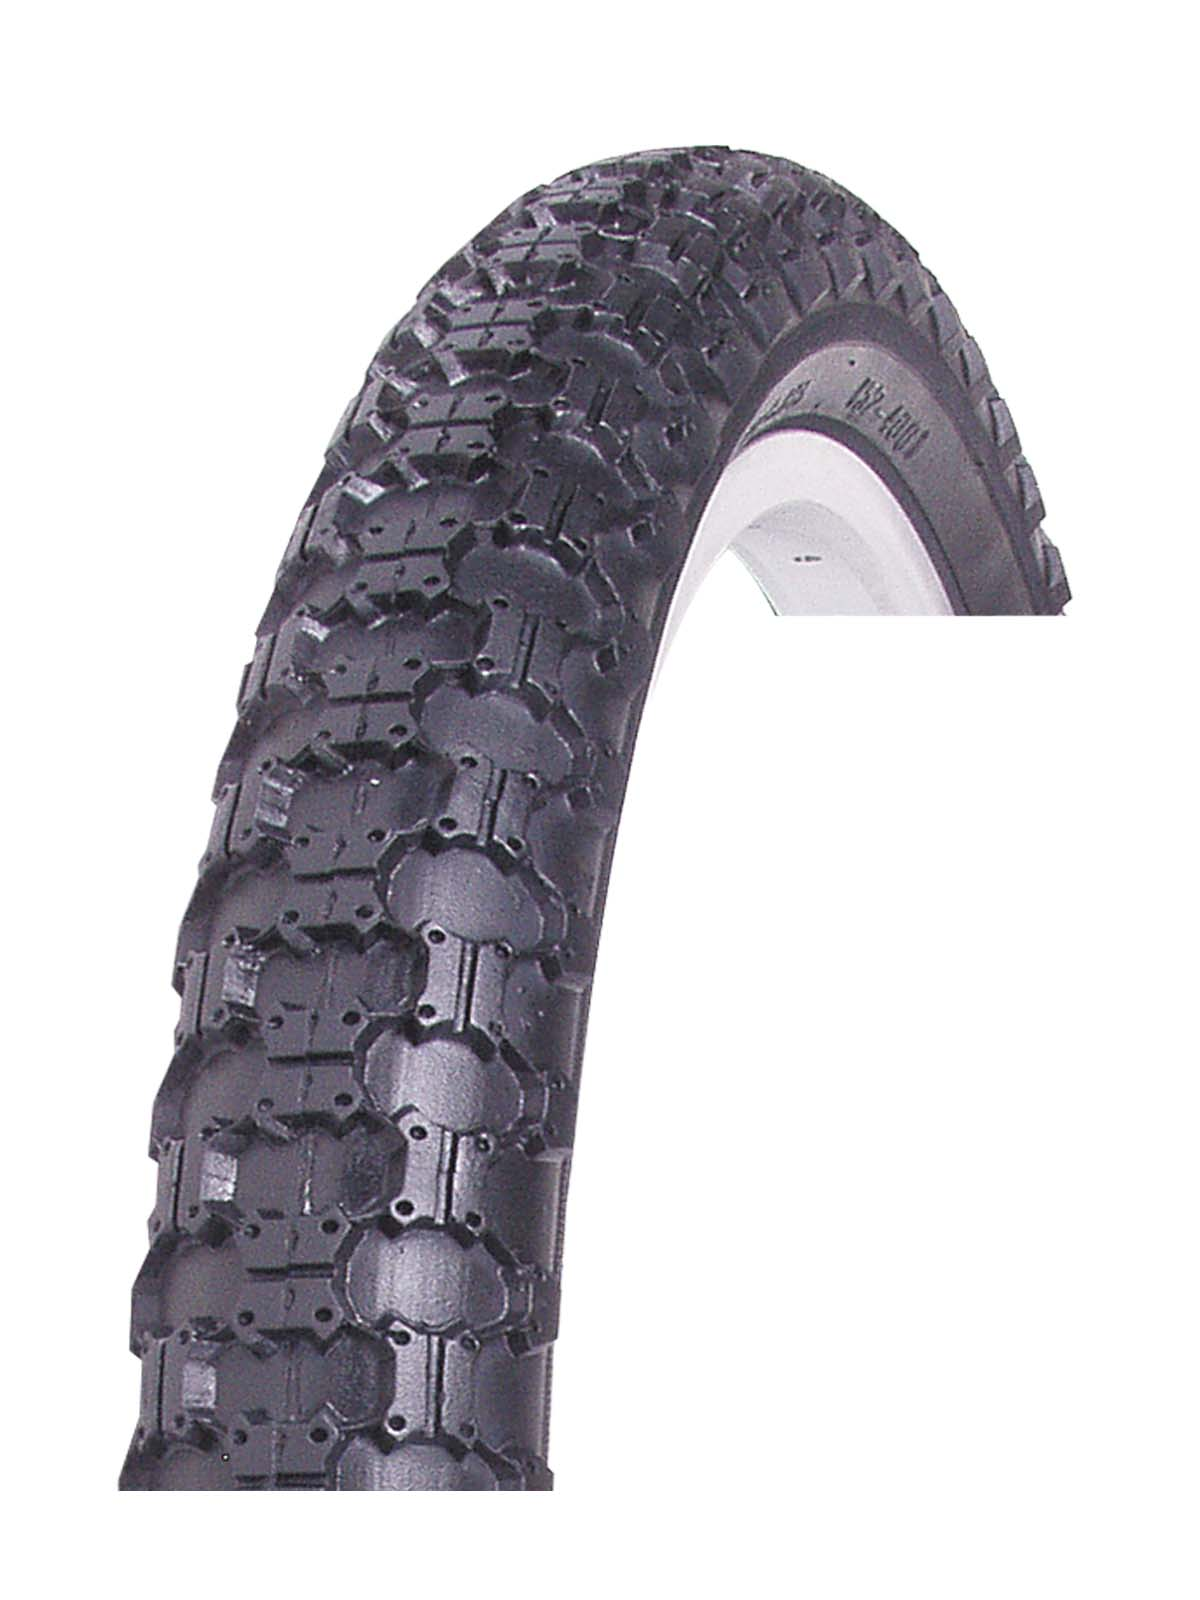 VEE RUBBER - Външна гума Vee Rubber 14x 2,125VRB024